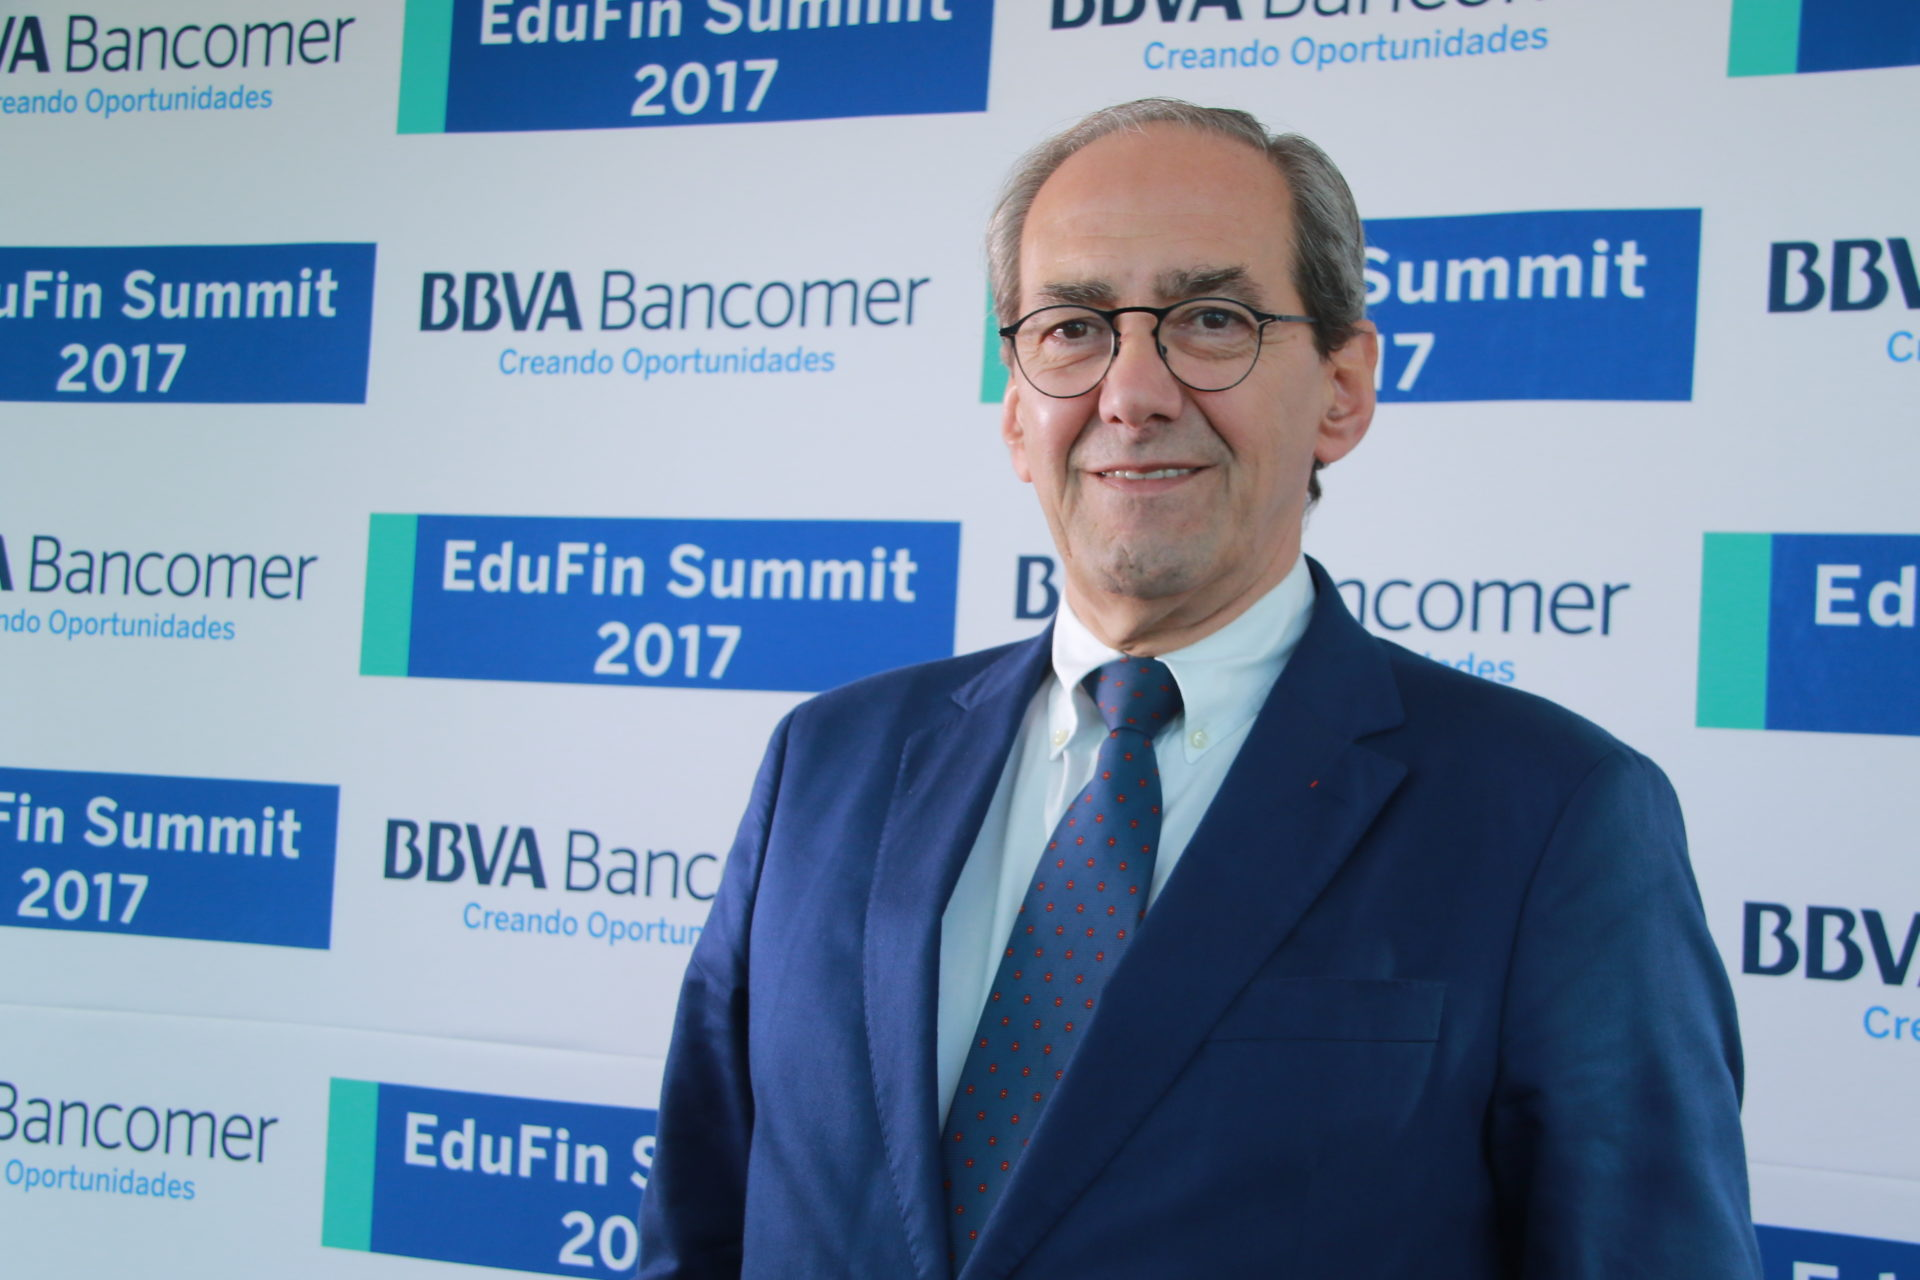 José manuel González-Paramo en Edufin Summit